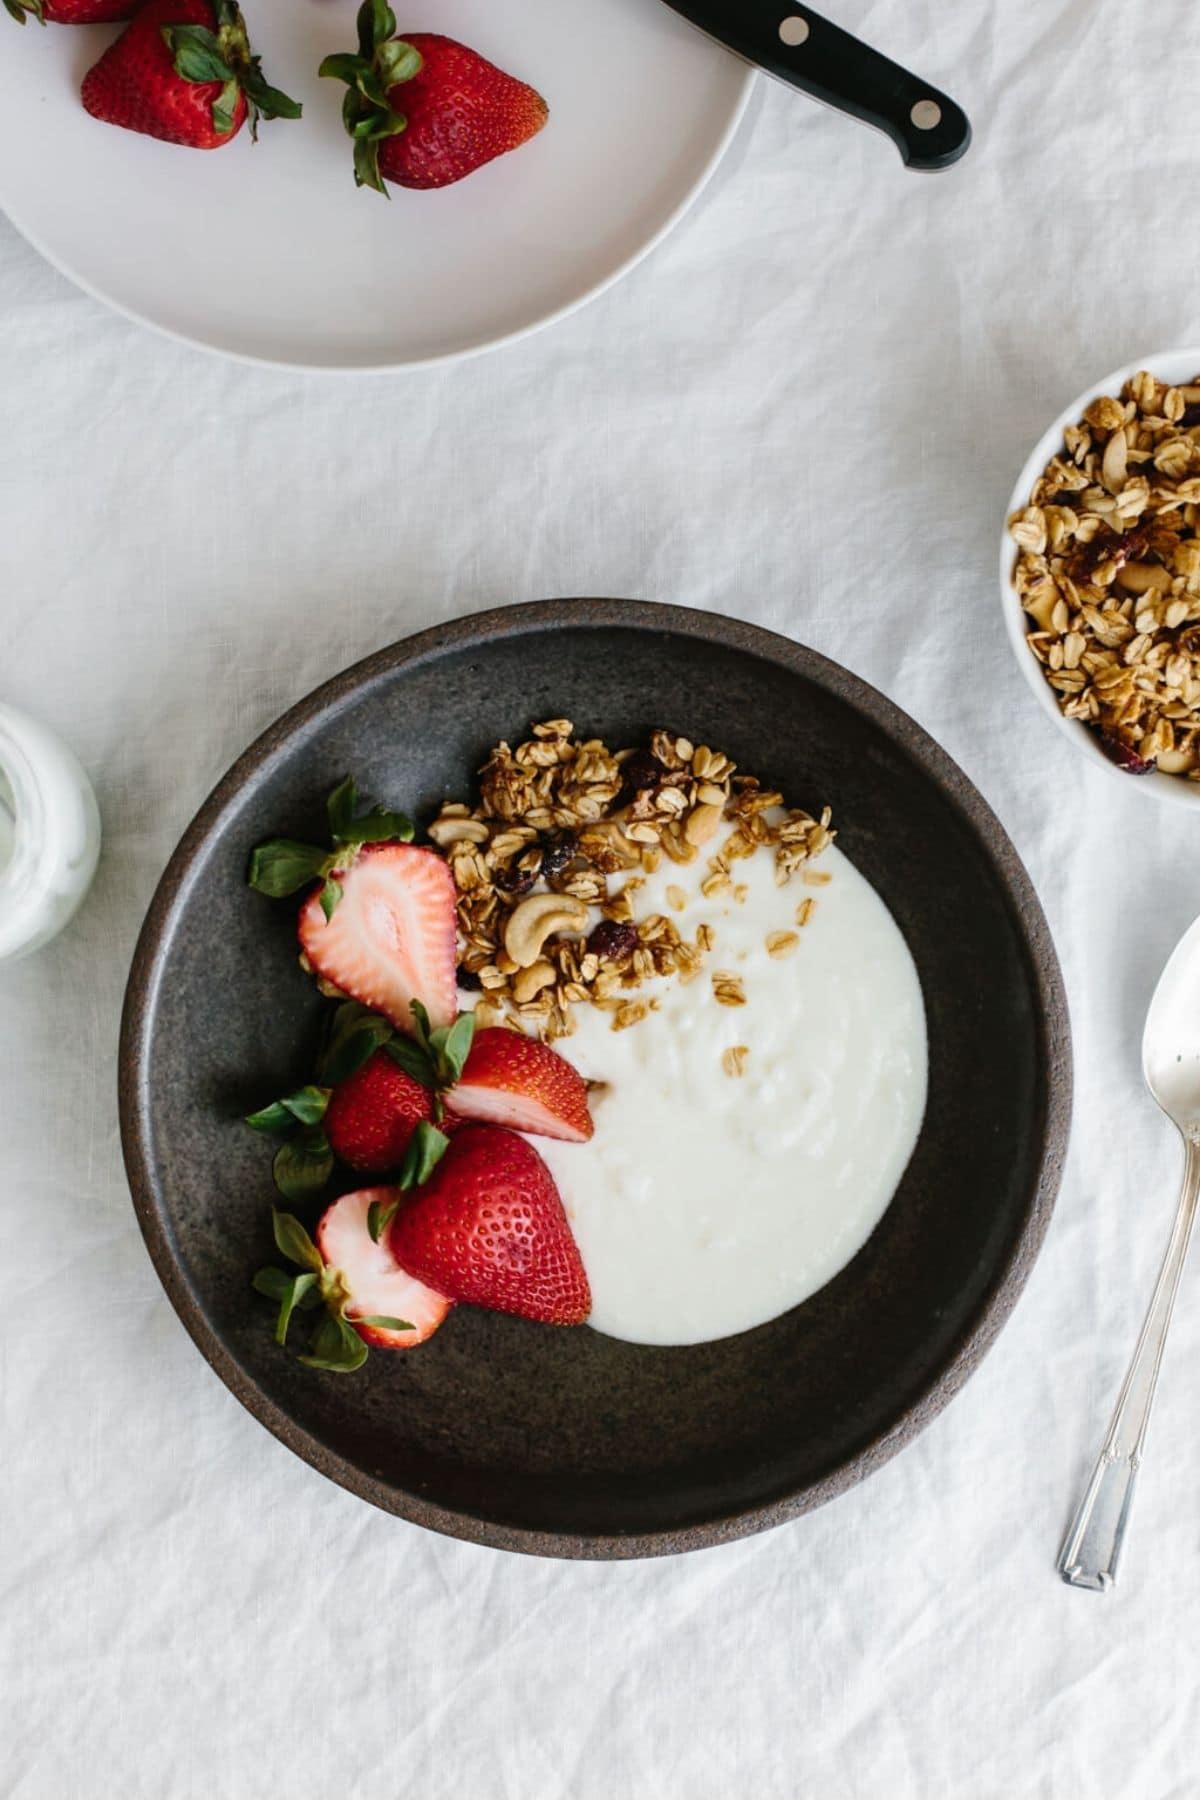 Black bowl of yogurt with sliced strawberries